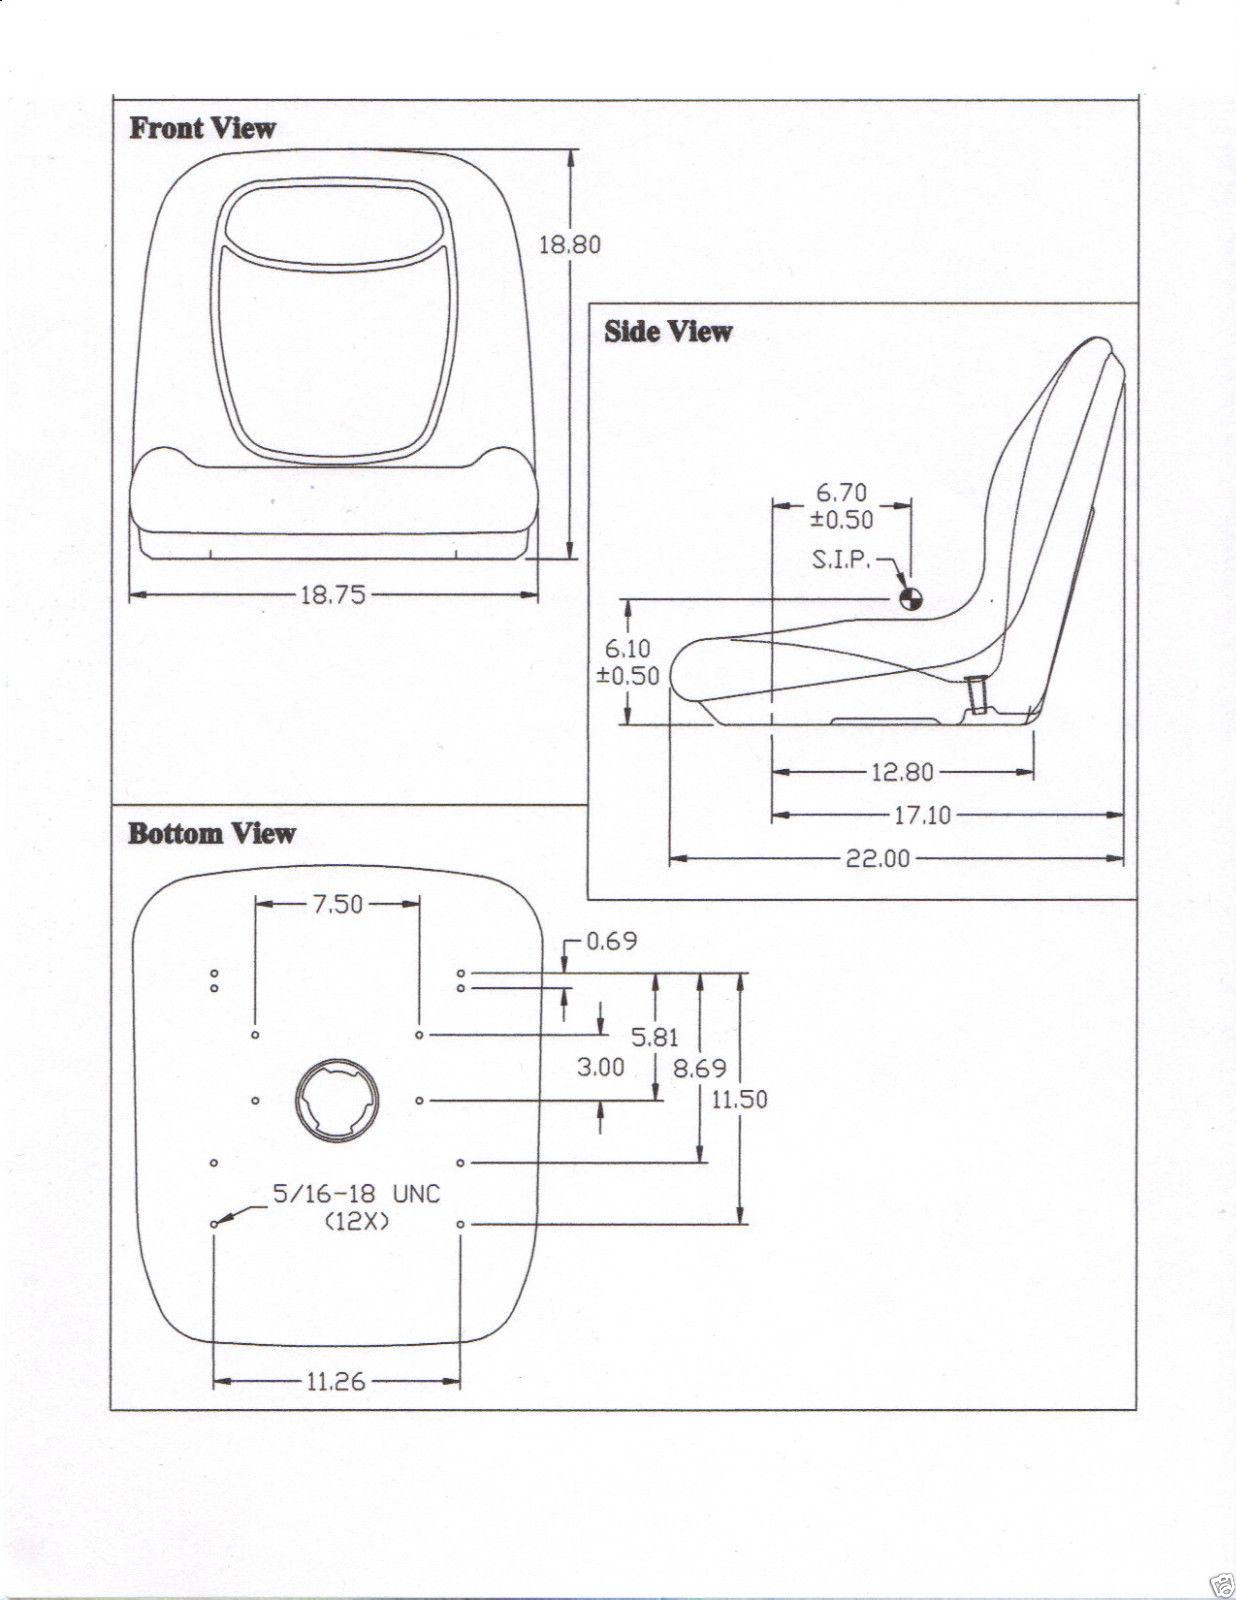 John Deere Gator 4x2 Wiring Diagram Gas Electrical Diagrams Amt 600 Trail 6x4 Somurich Com Body Parts